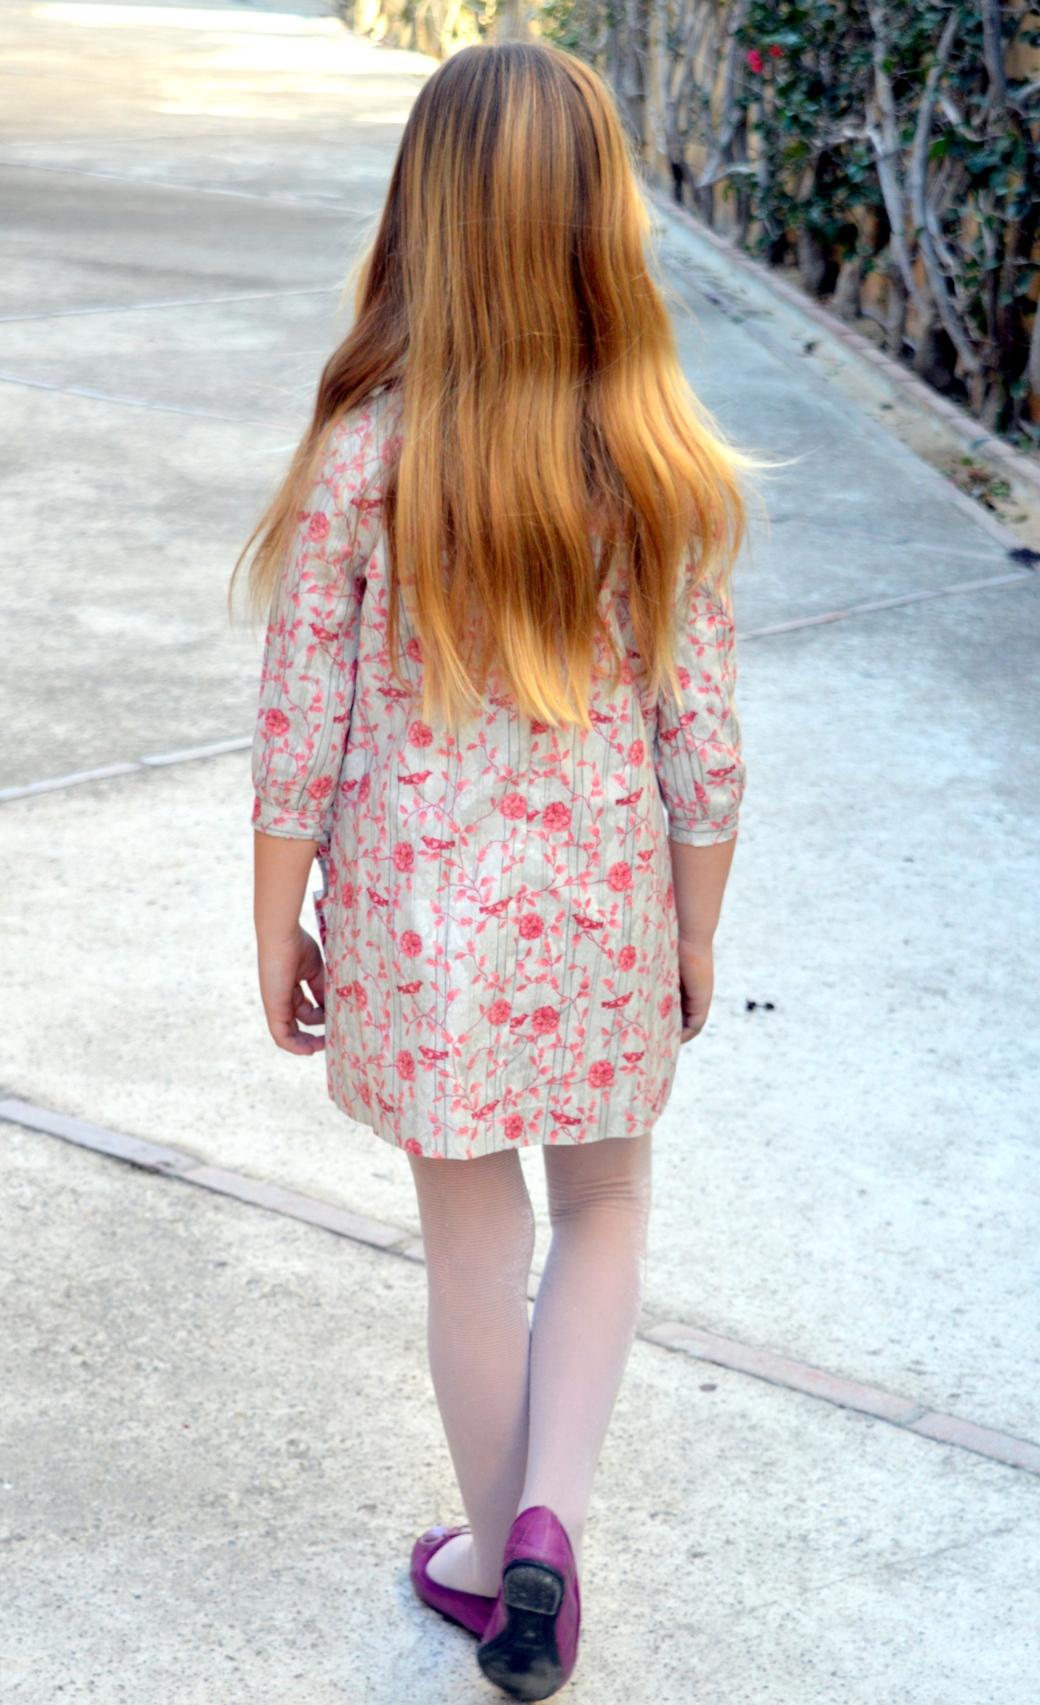 moodblue blog de moda infantil y juvenil 15